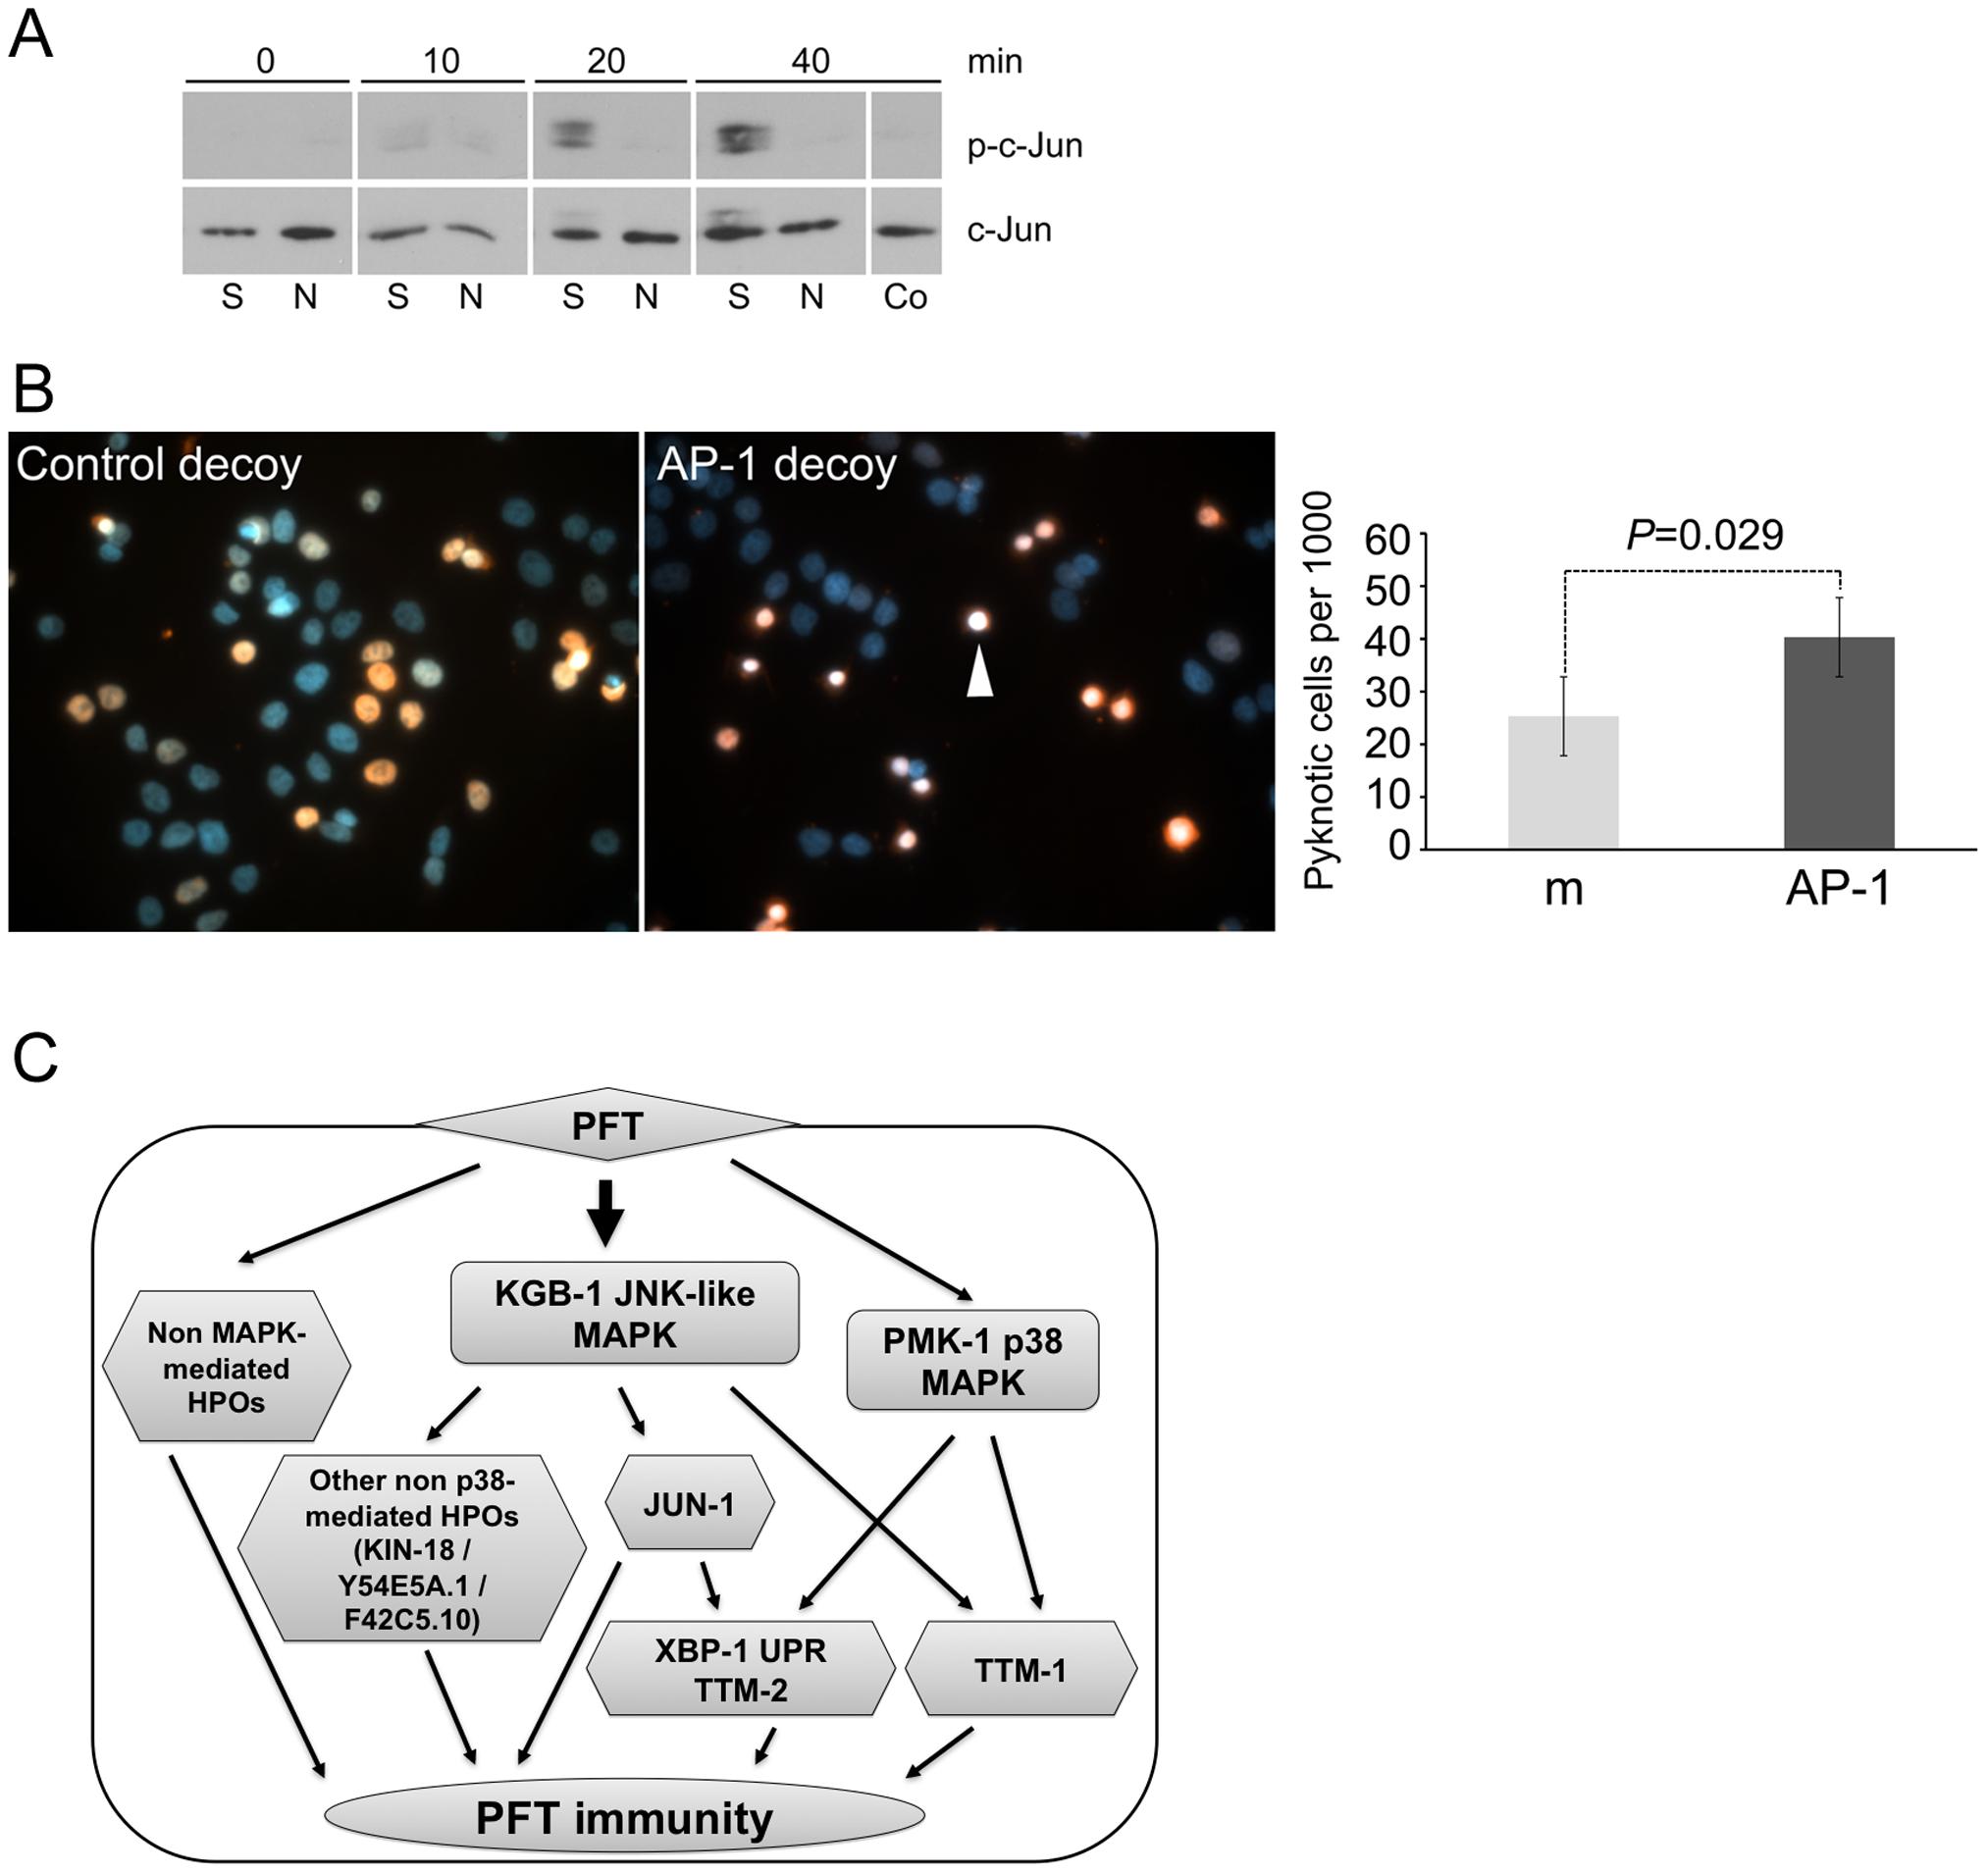 AP-1 protects against mammalian PFTs.